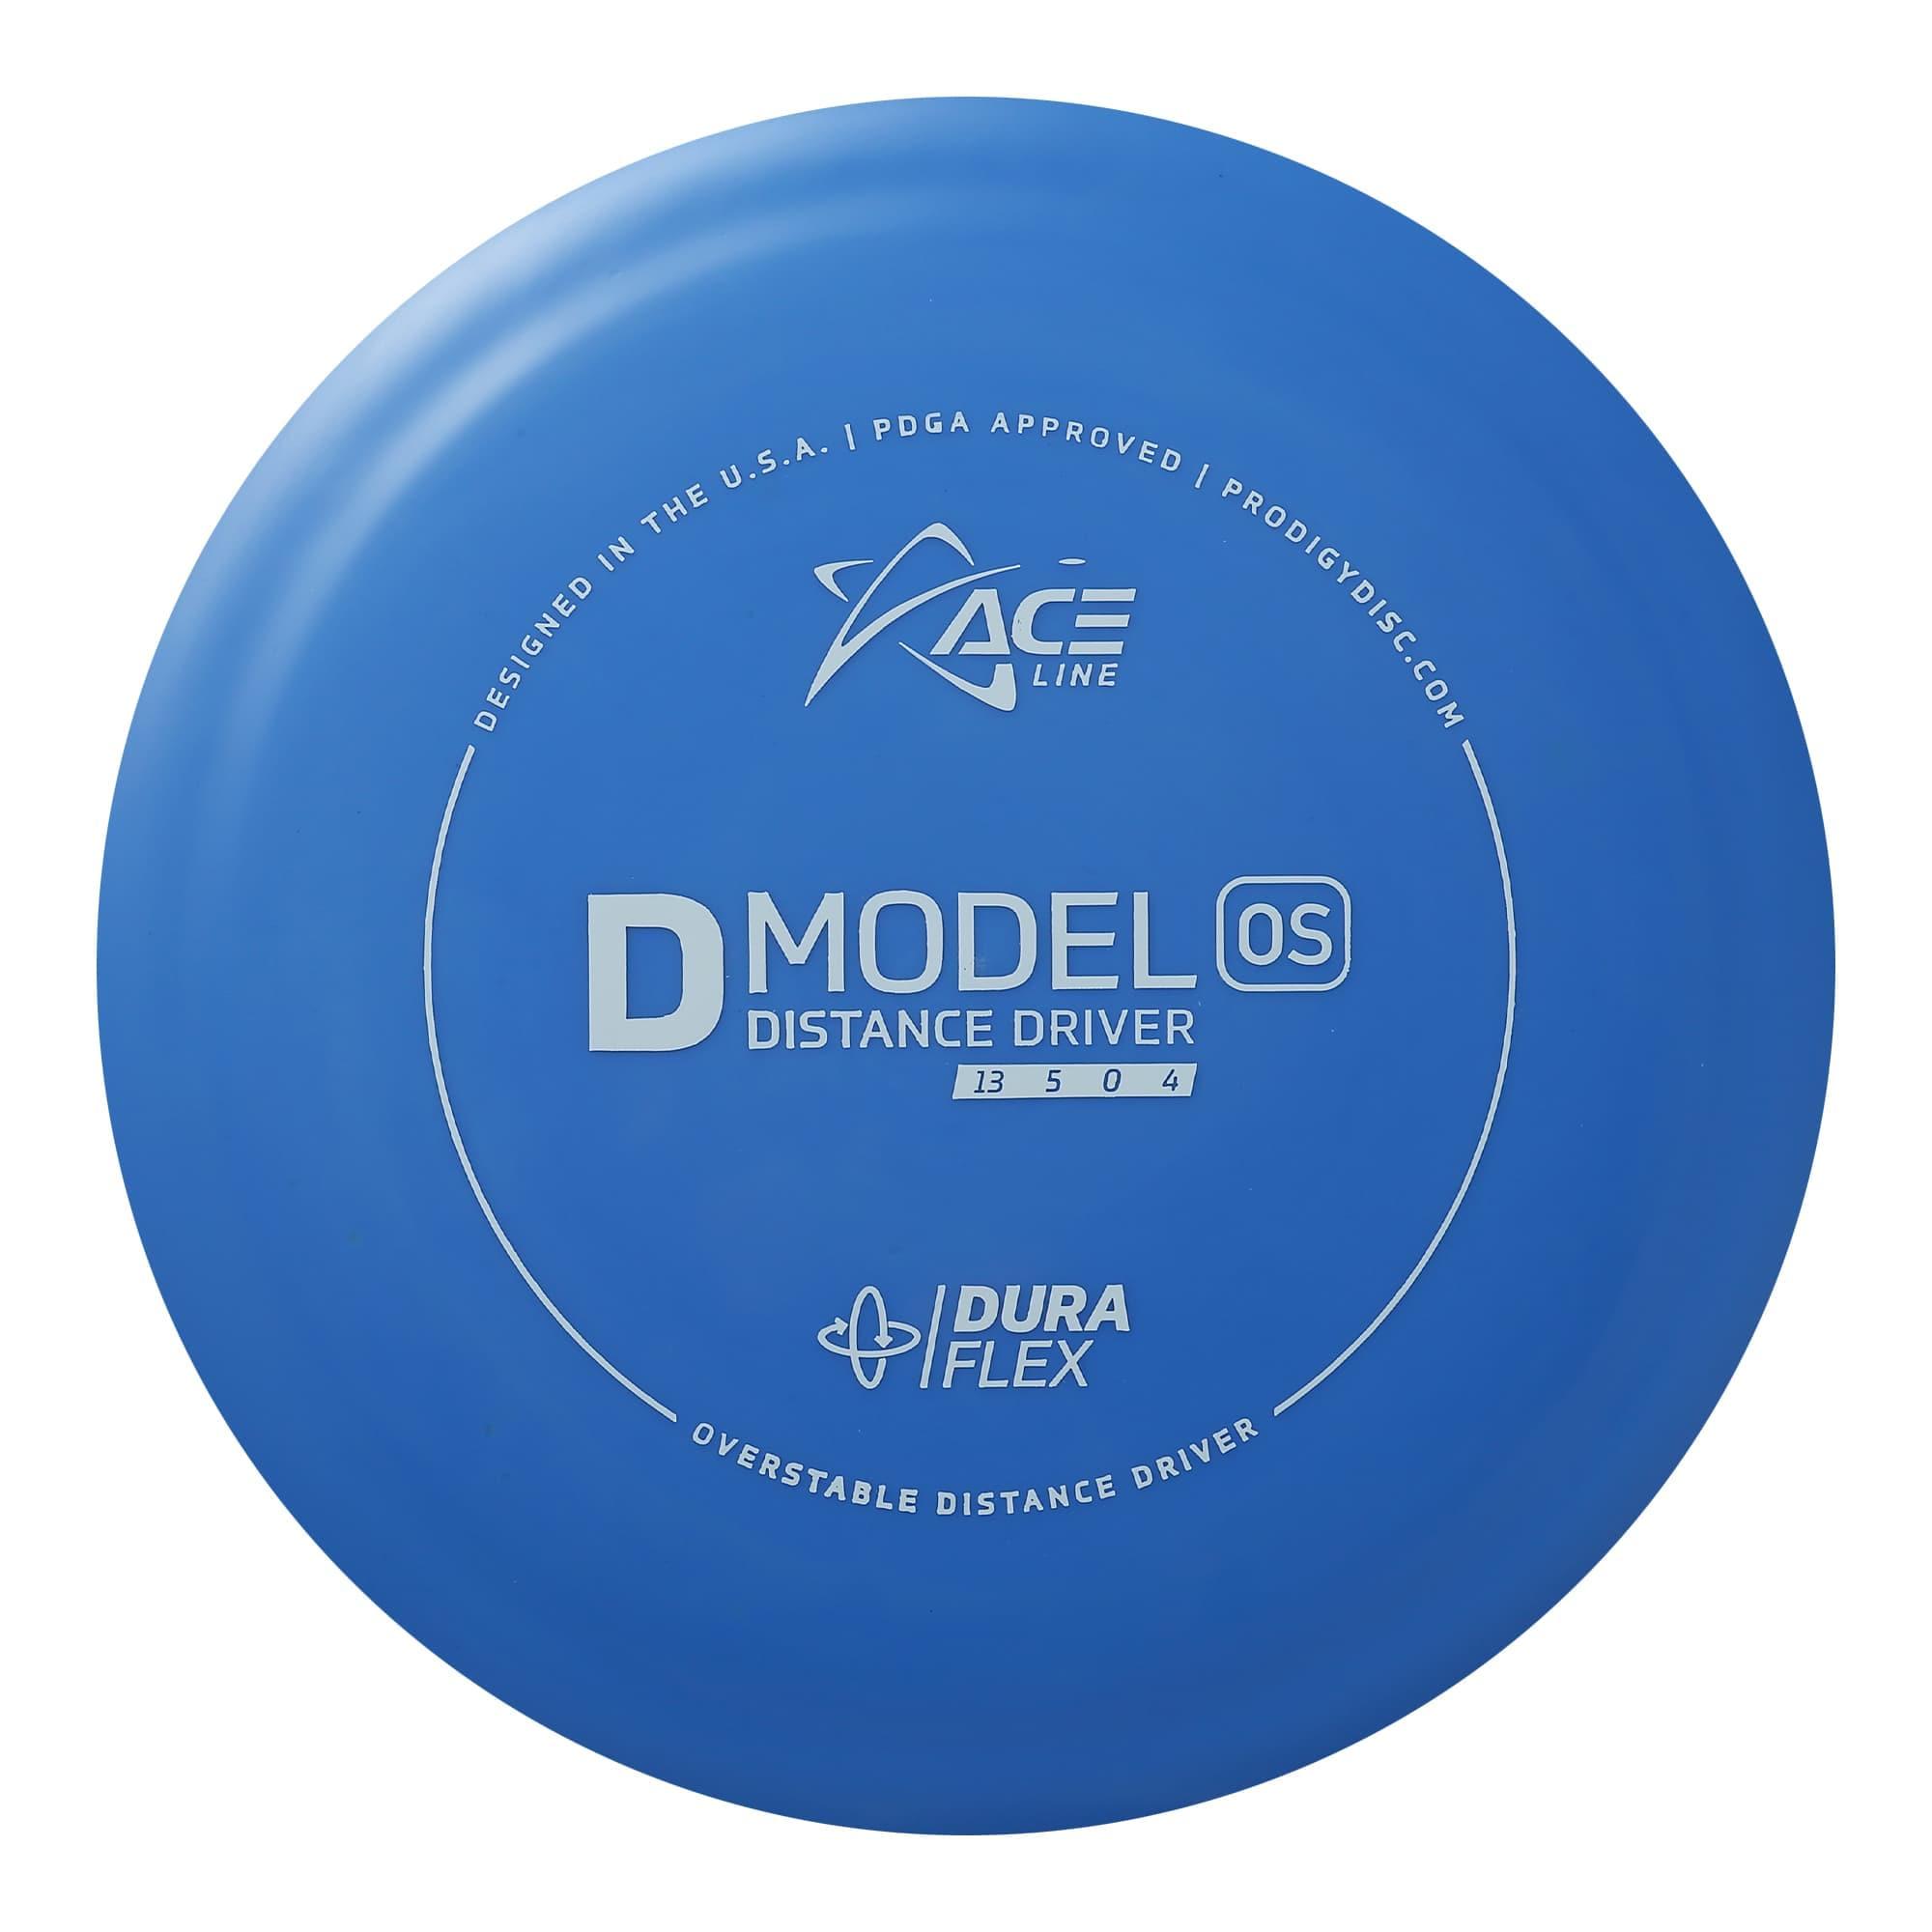 Prodigy Ace Duraflex D-Model OS